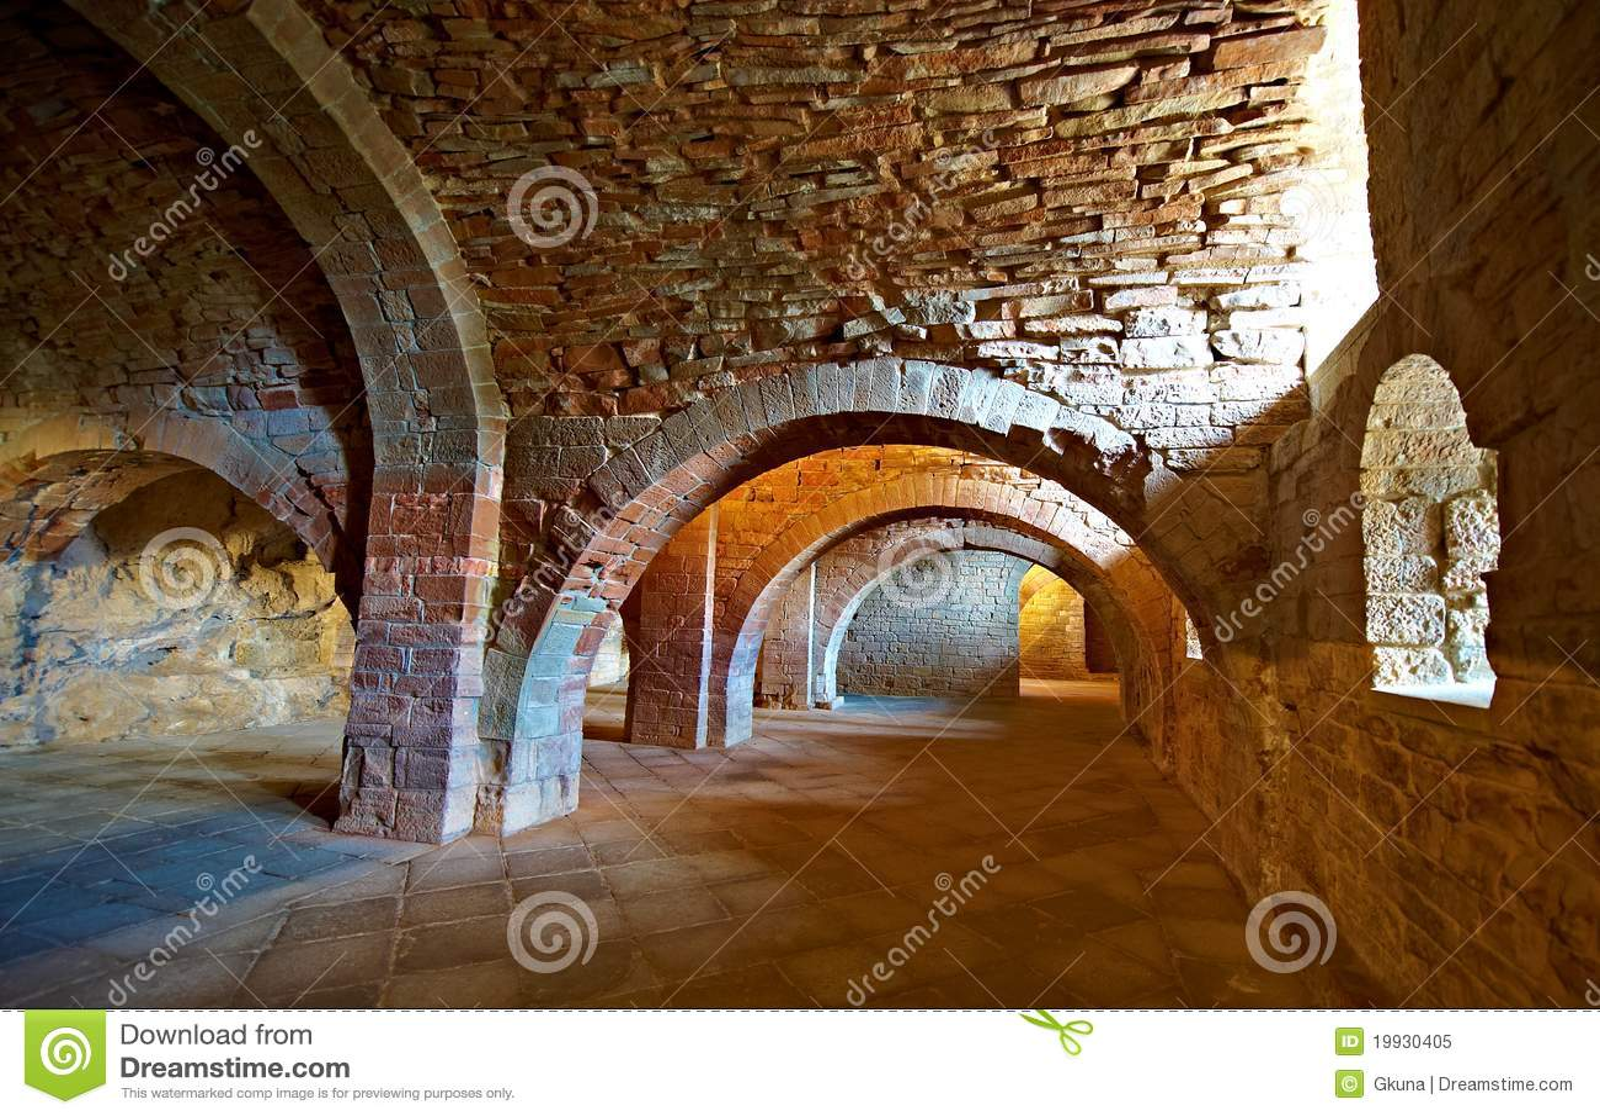 Dungeon Vaulted